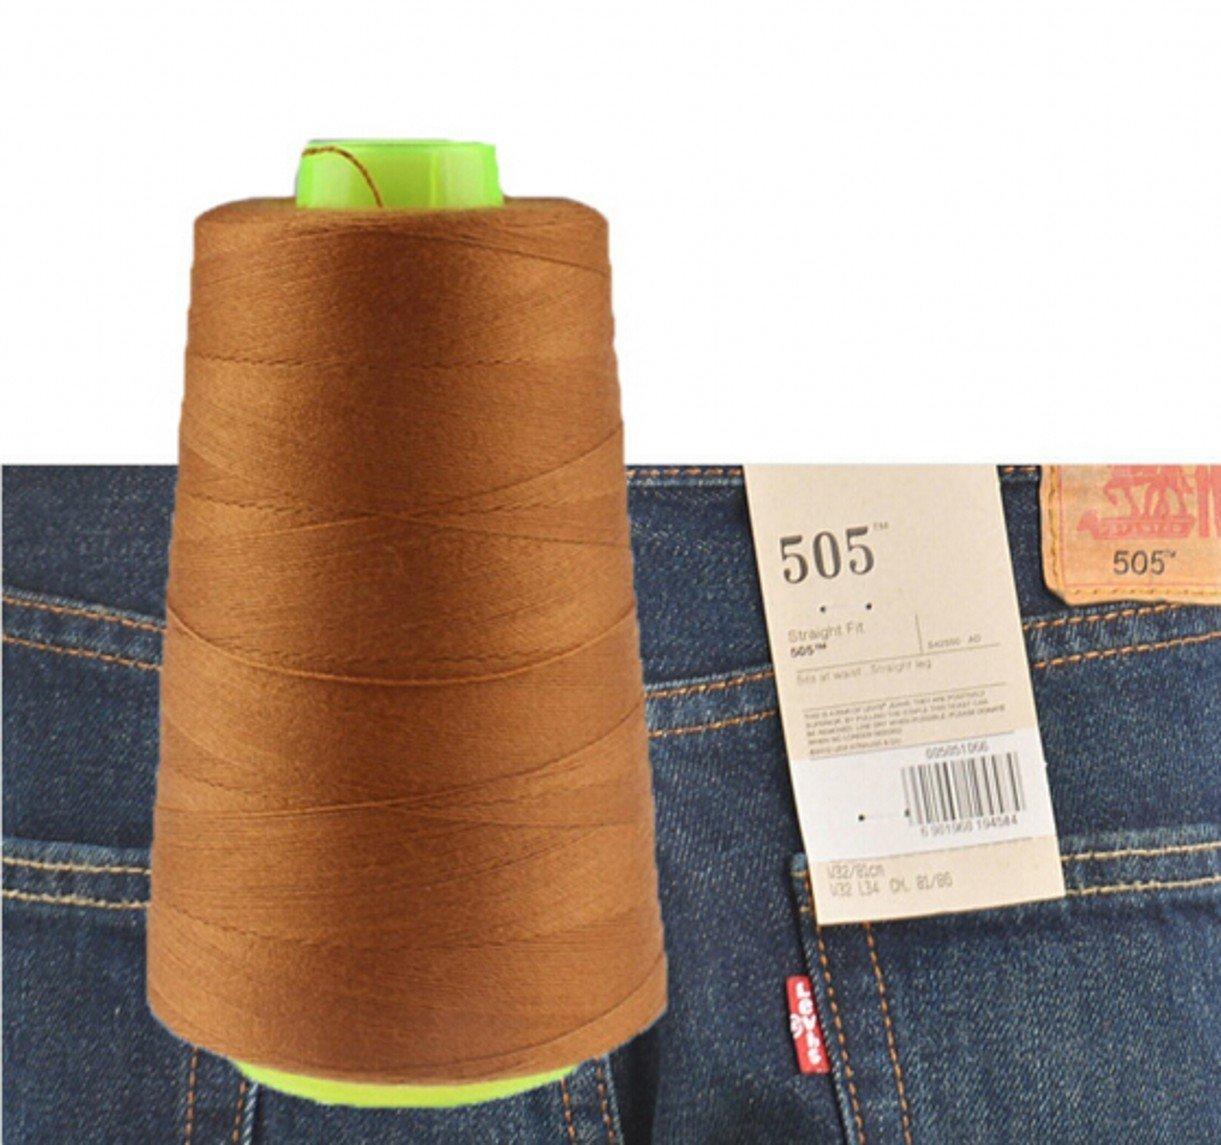 chengyida 1 bobina de hilo de coser para pantalones vaqueros para máquina de coser 3000 yardas Industrial poliéster hilo de coser vaqueros 20s/3 - (Jiang ...